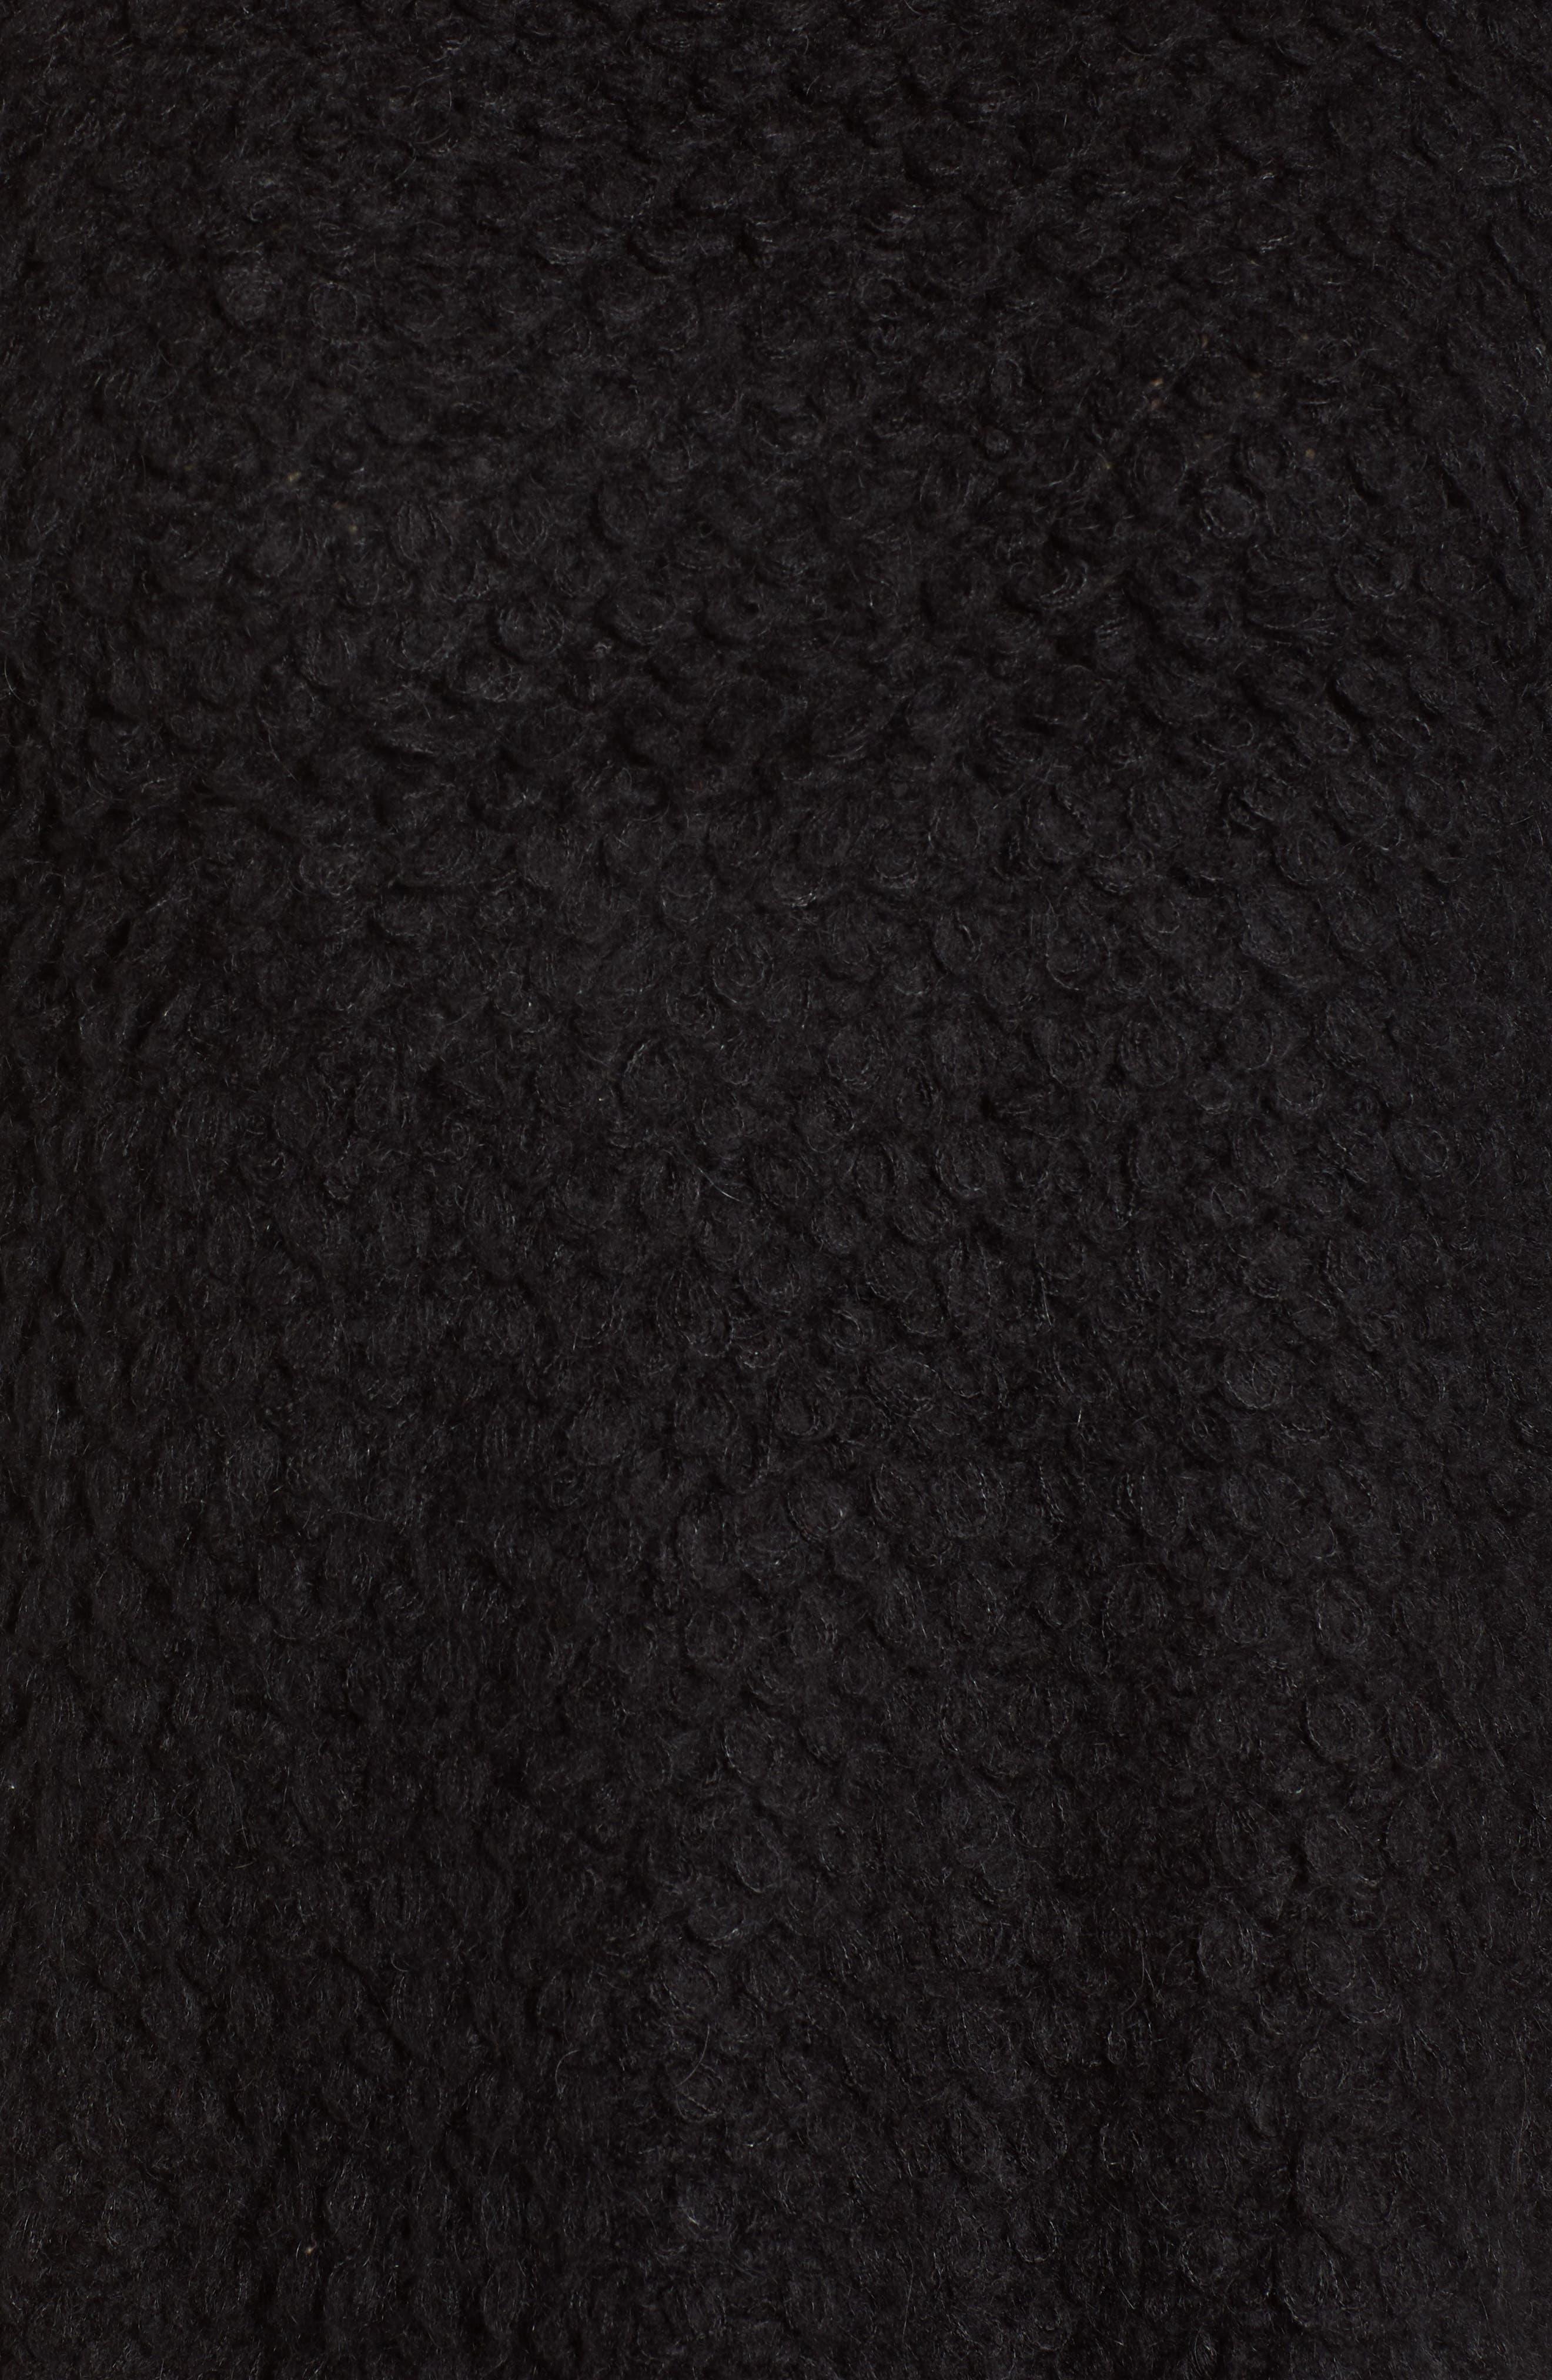 Loop Stitch Crewneck Sweater,                             Alternate thumbnail 5, color,                             Black